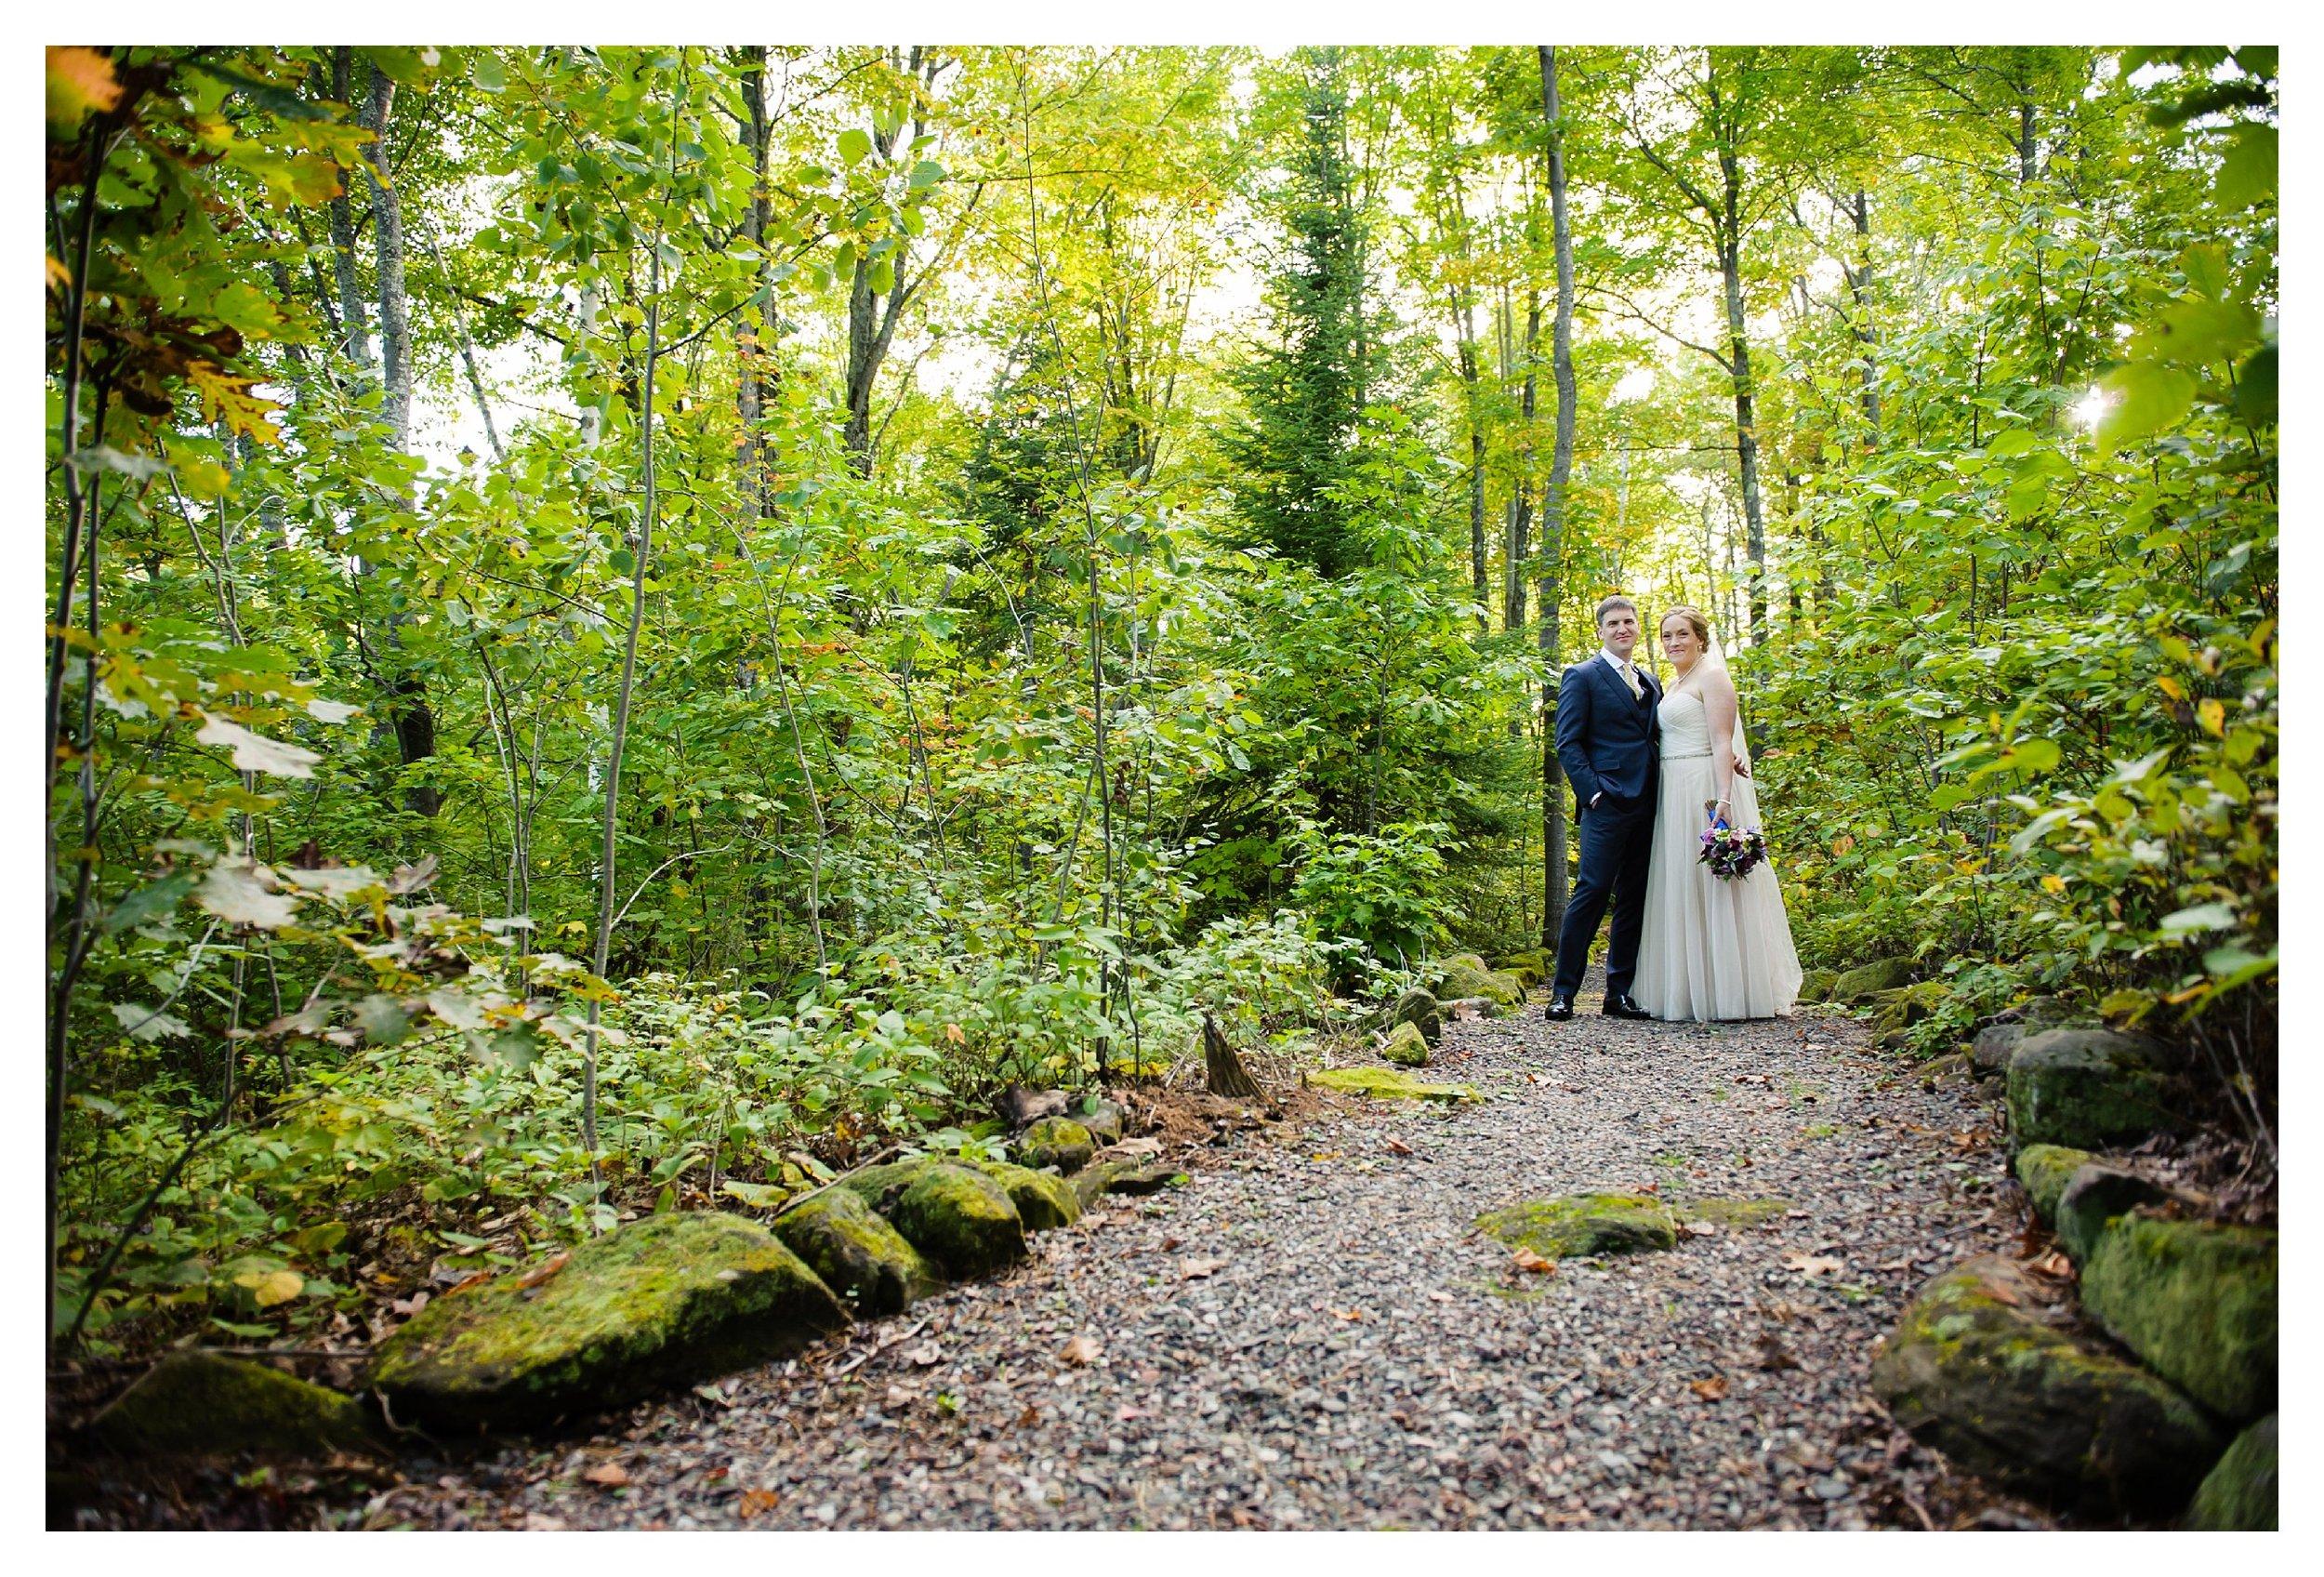 Lindstrom MN Twin cities Minnesota northwoods Bayfield wisconsin destination wedding ps 139 photography_0477.jpg